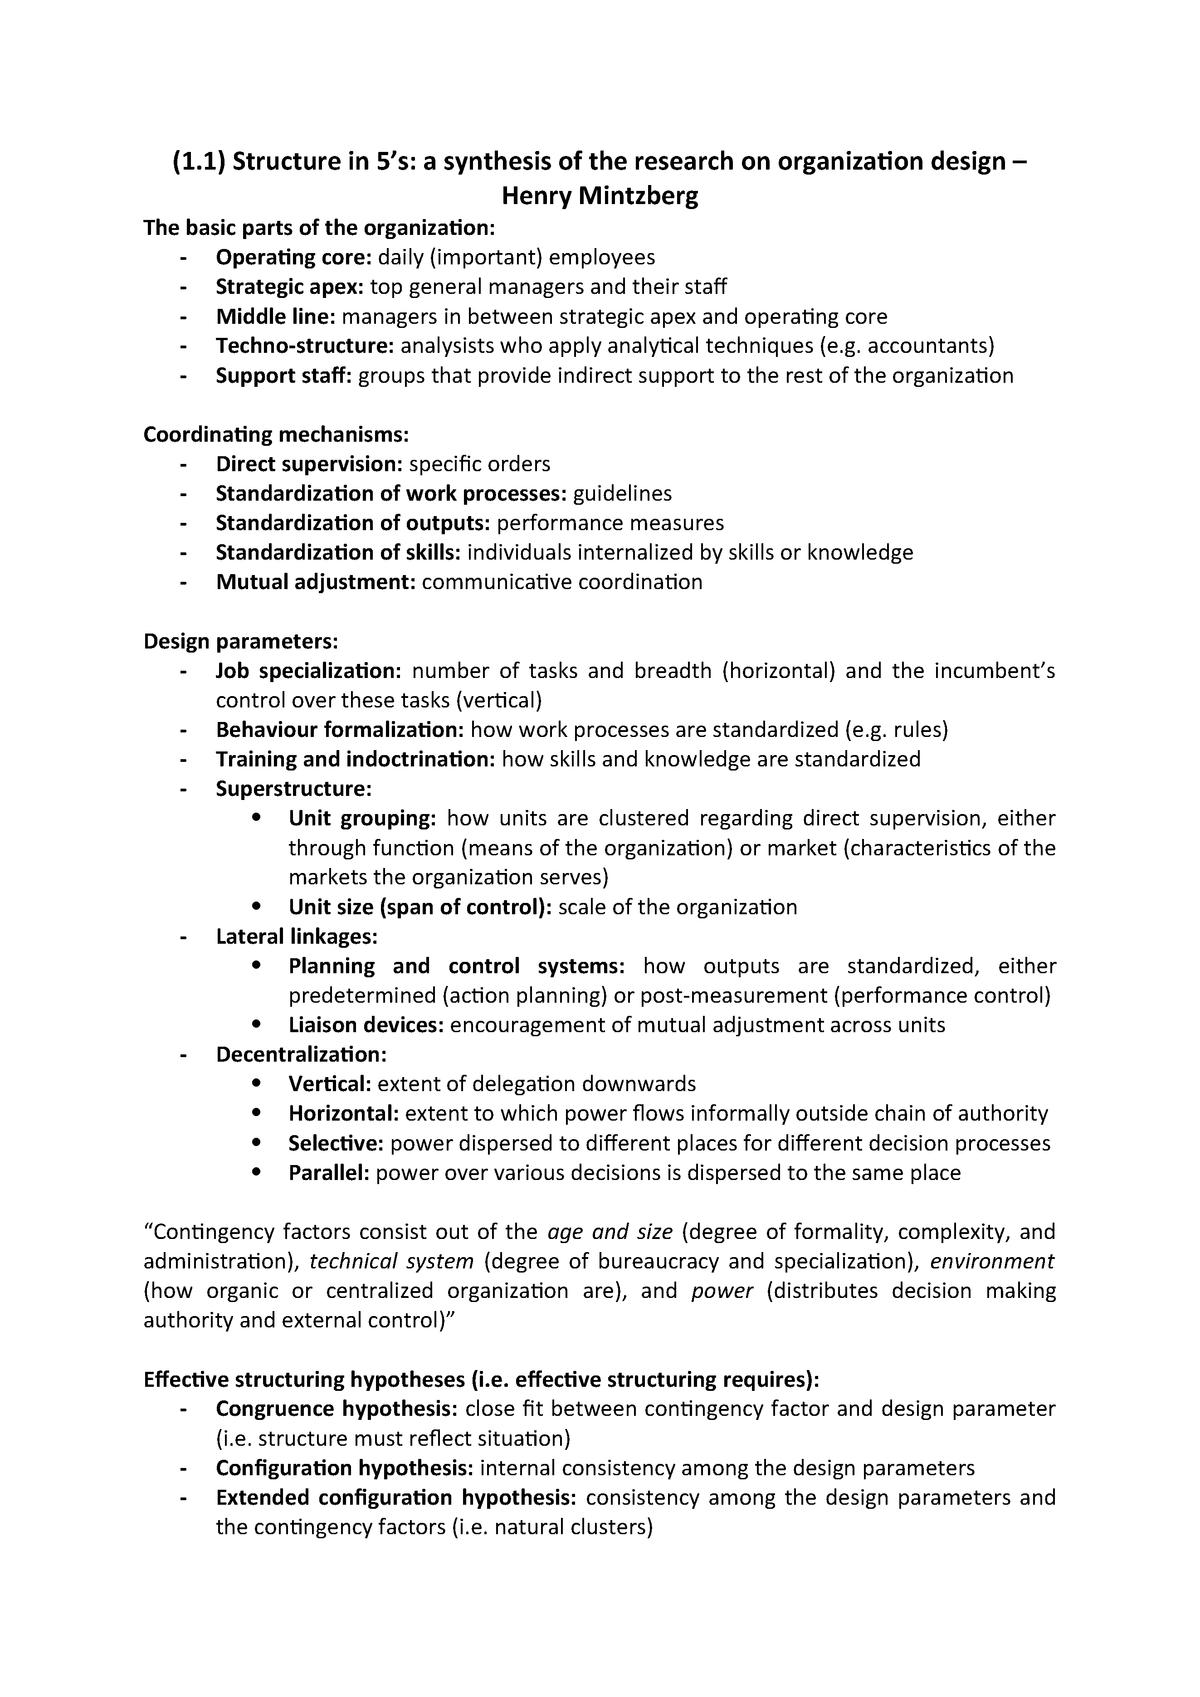 Organization Design Papers Summaries Ebm049a05 Rug Studeersnel